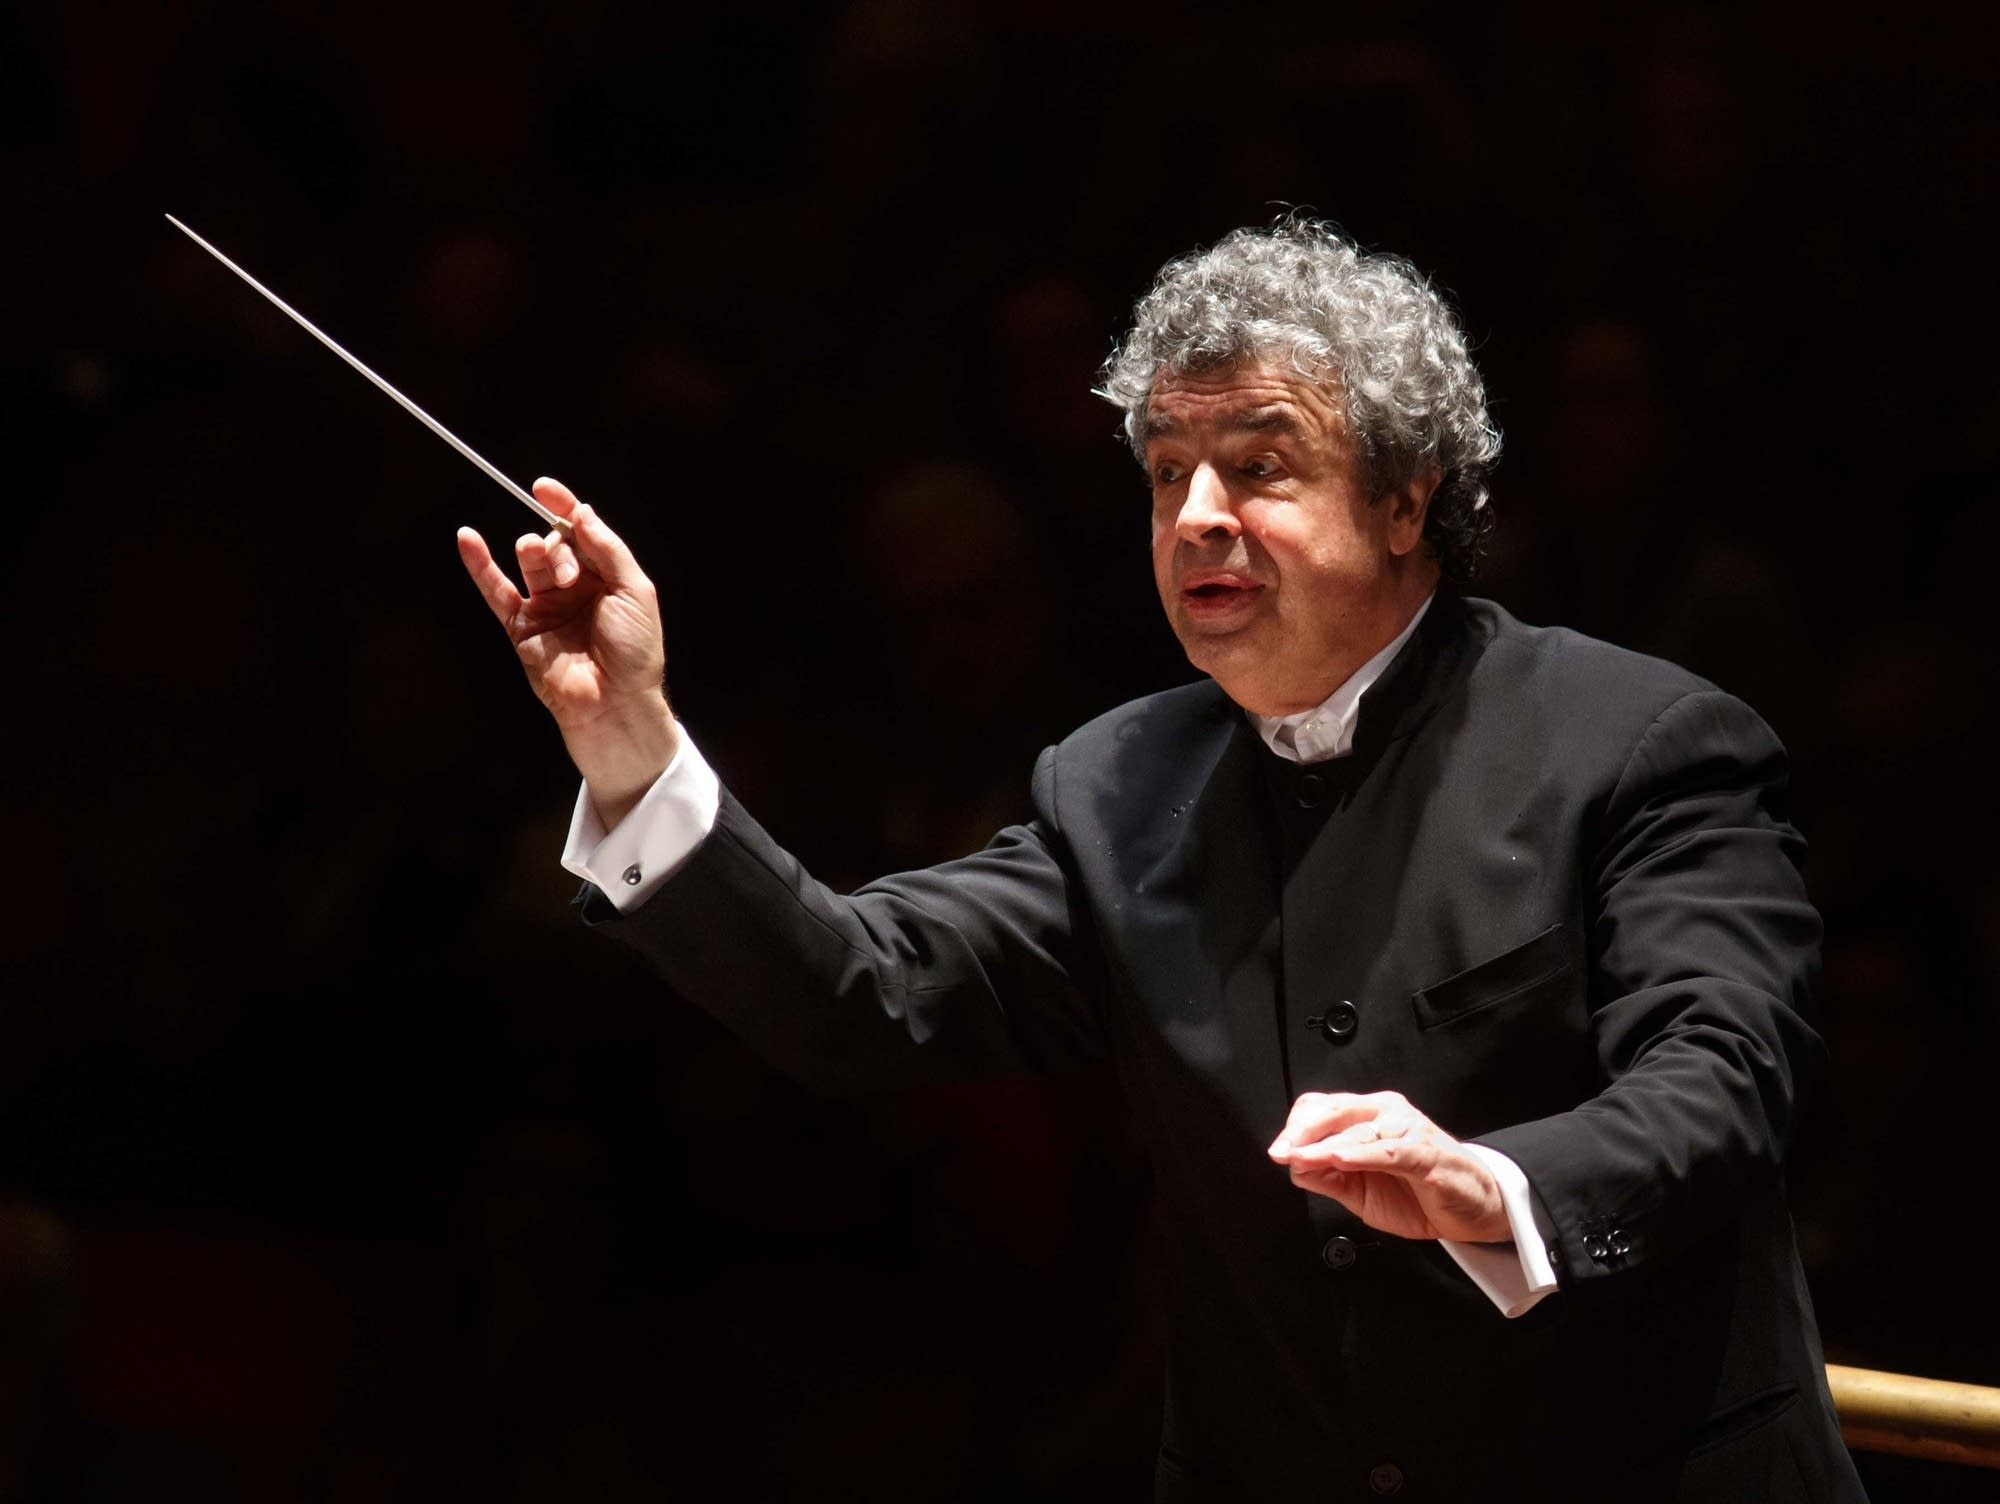 Conductor Semyon Bychkov